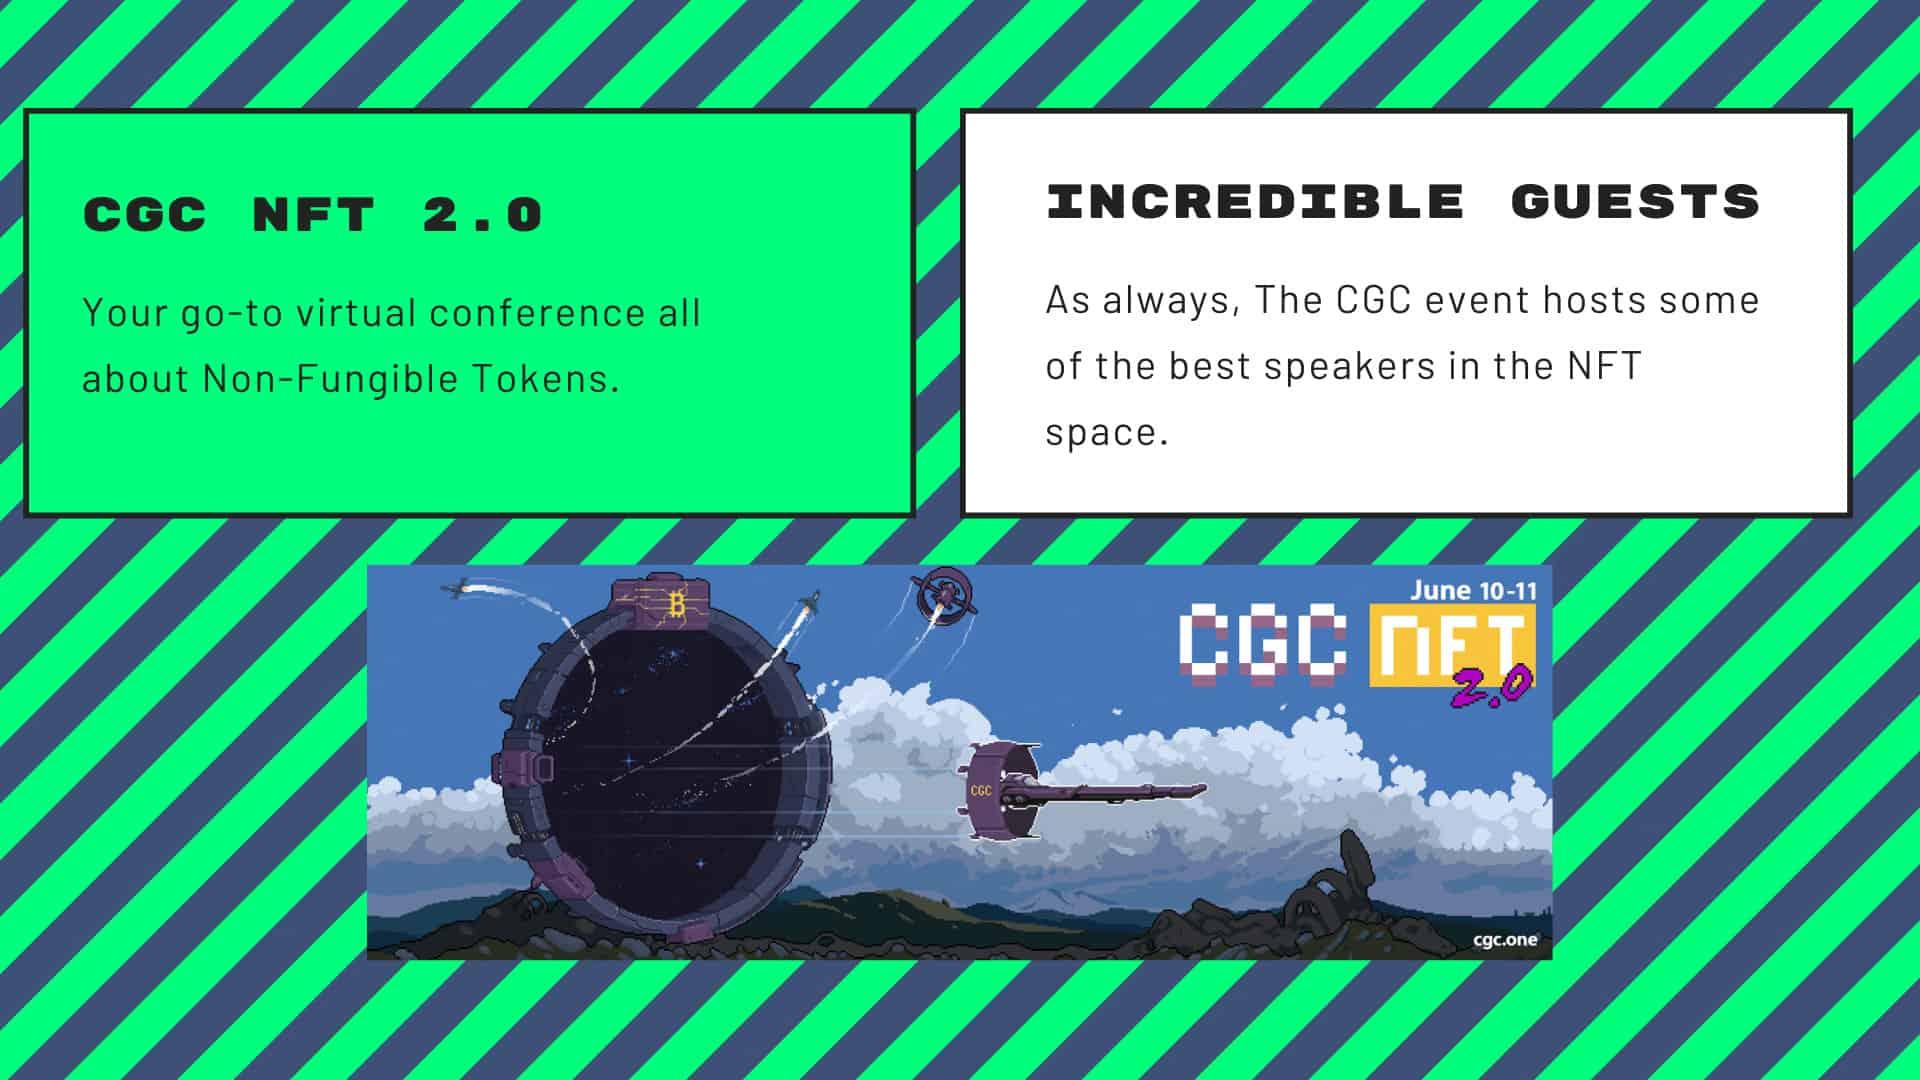 CGC NFT 2.0